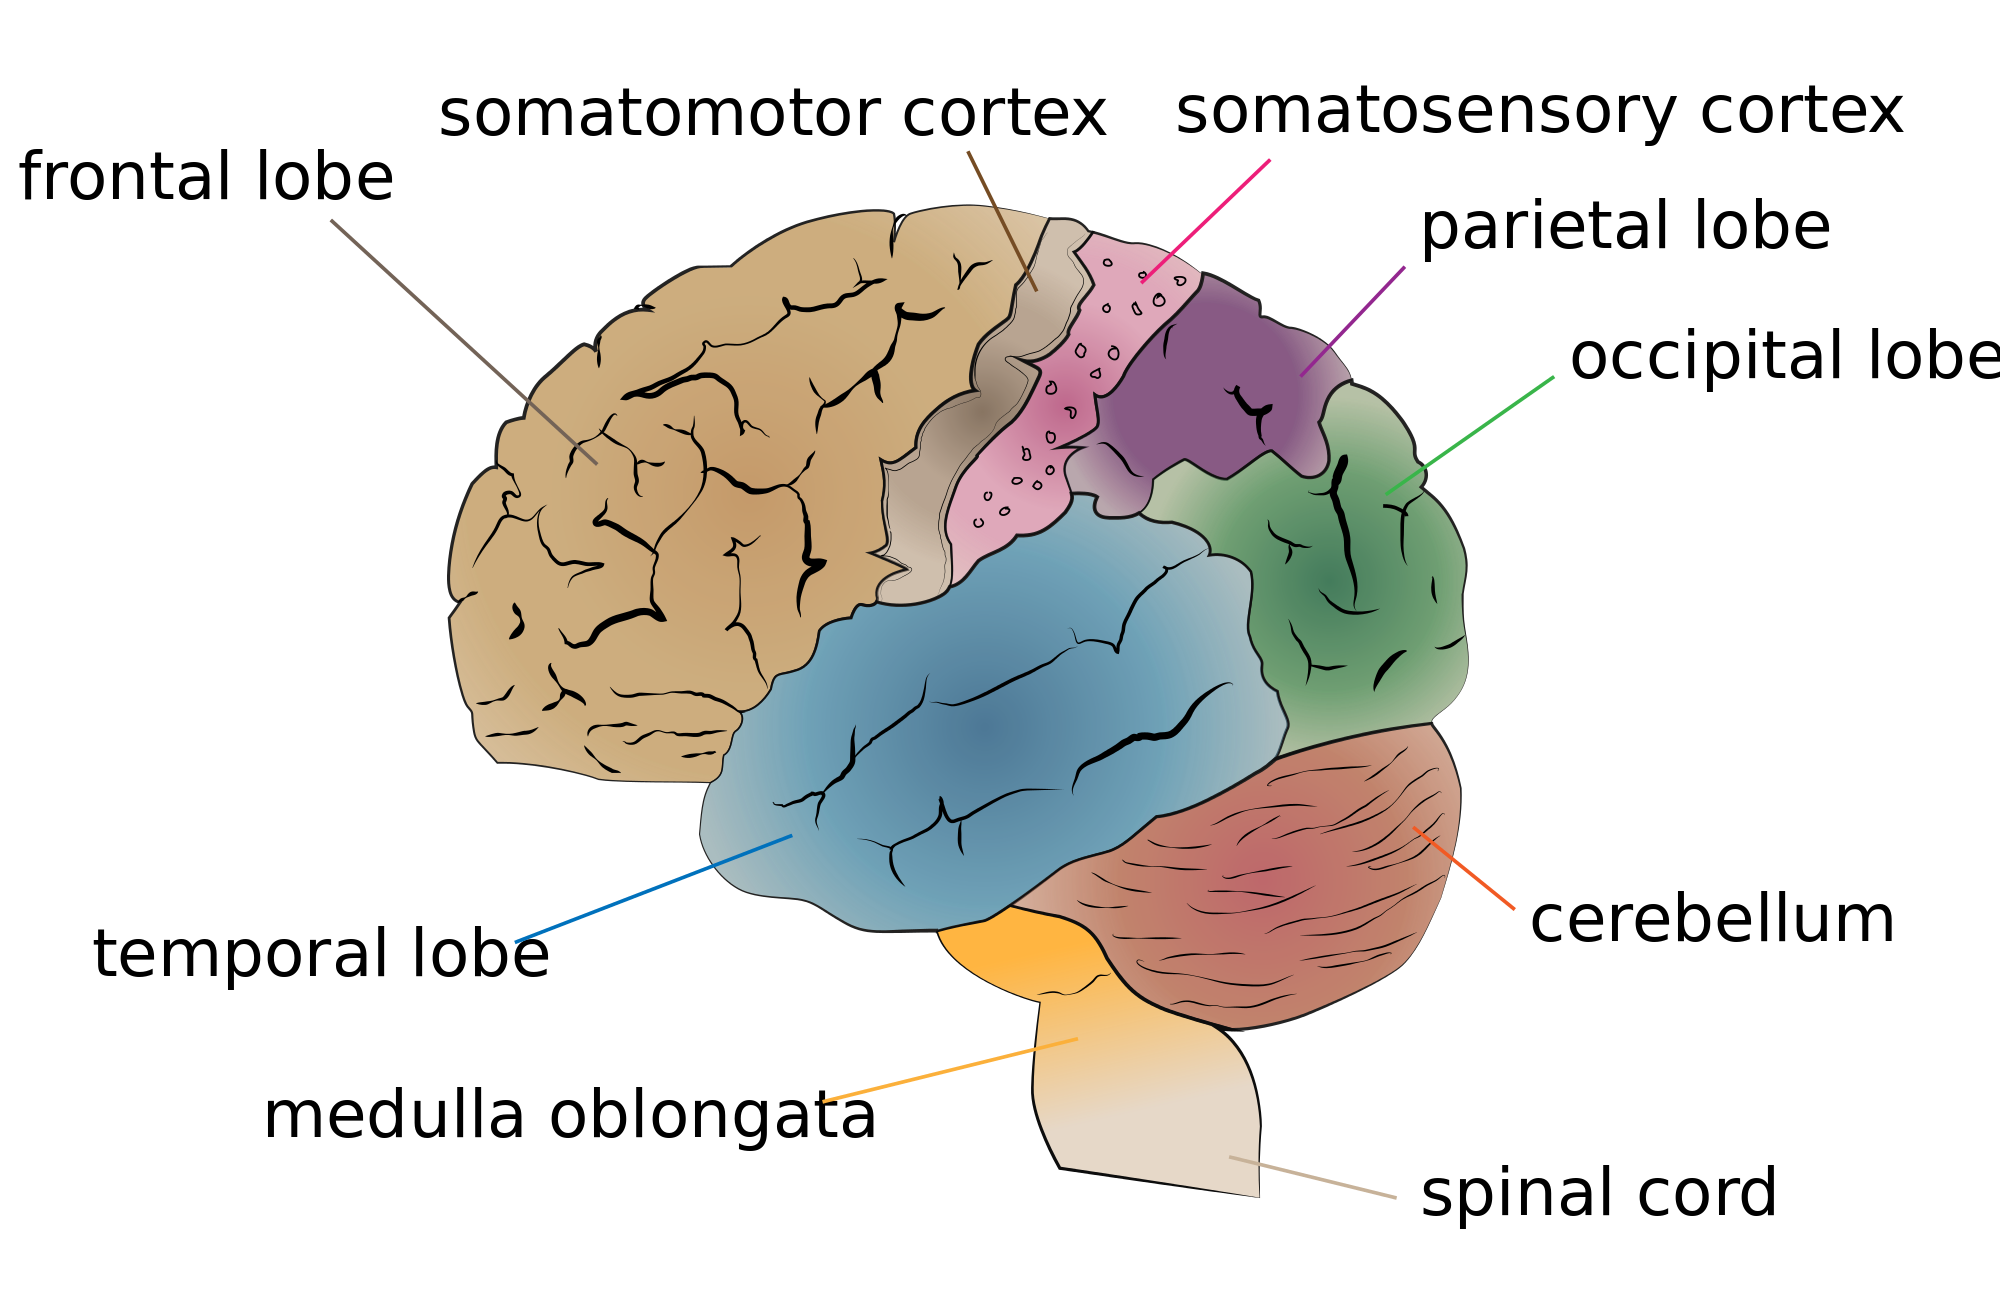 The adult brain